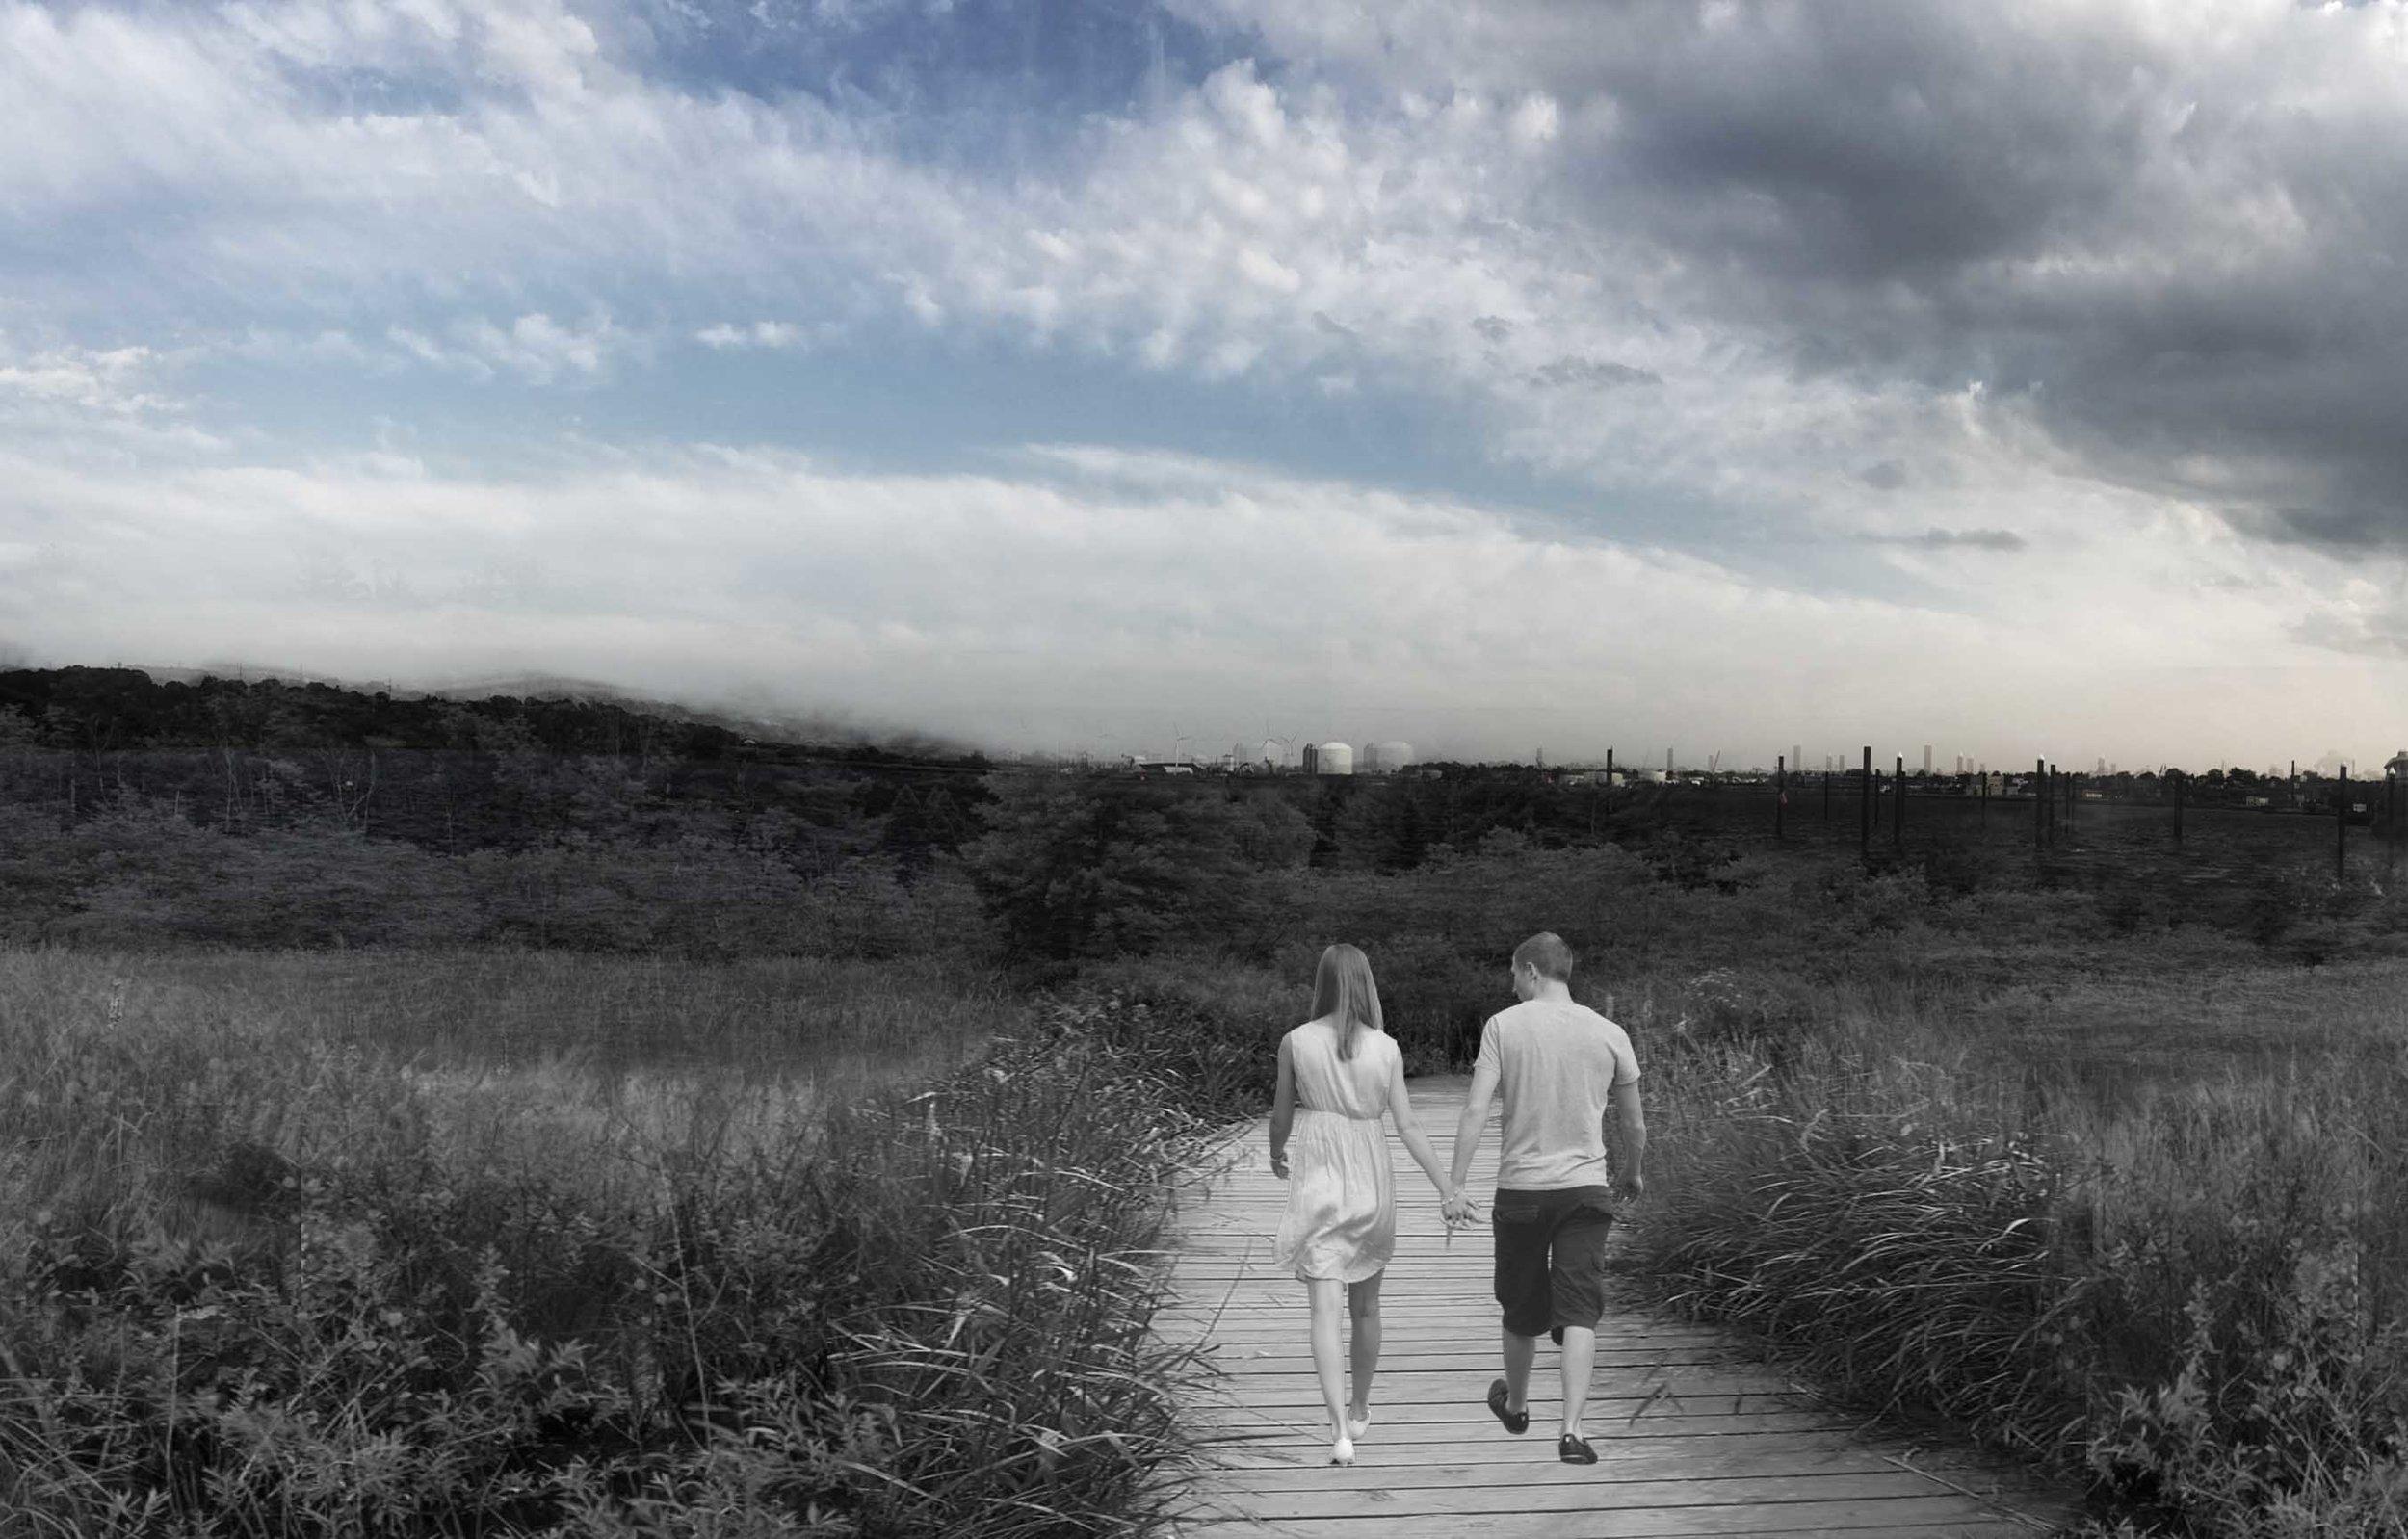 Wetland Path for Great Egret Observation.